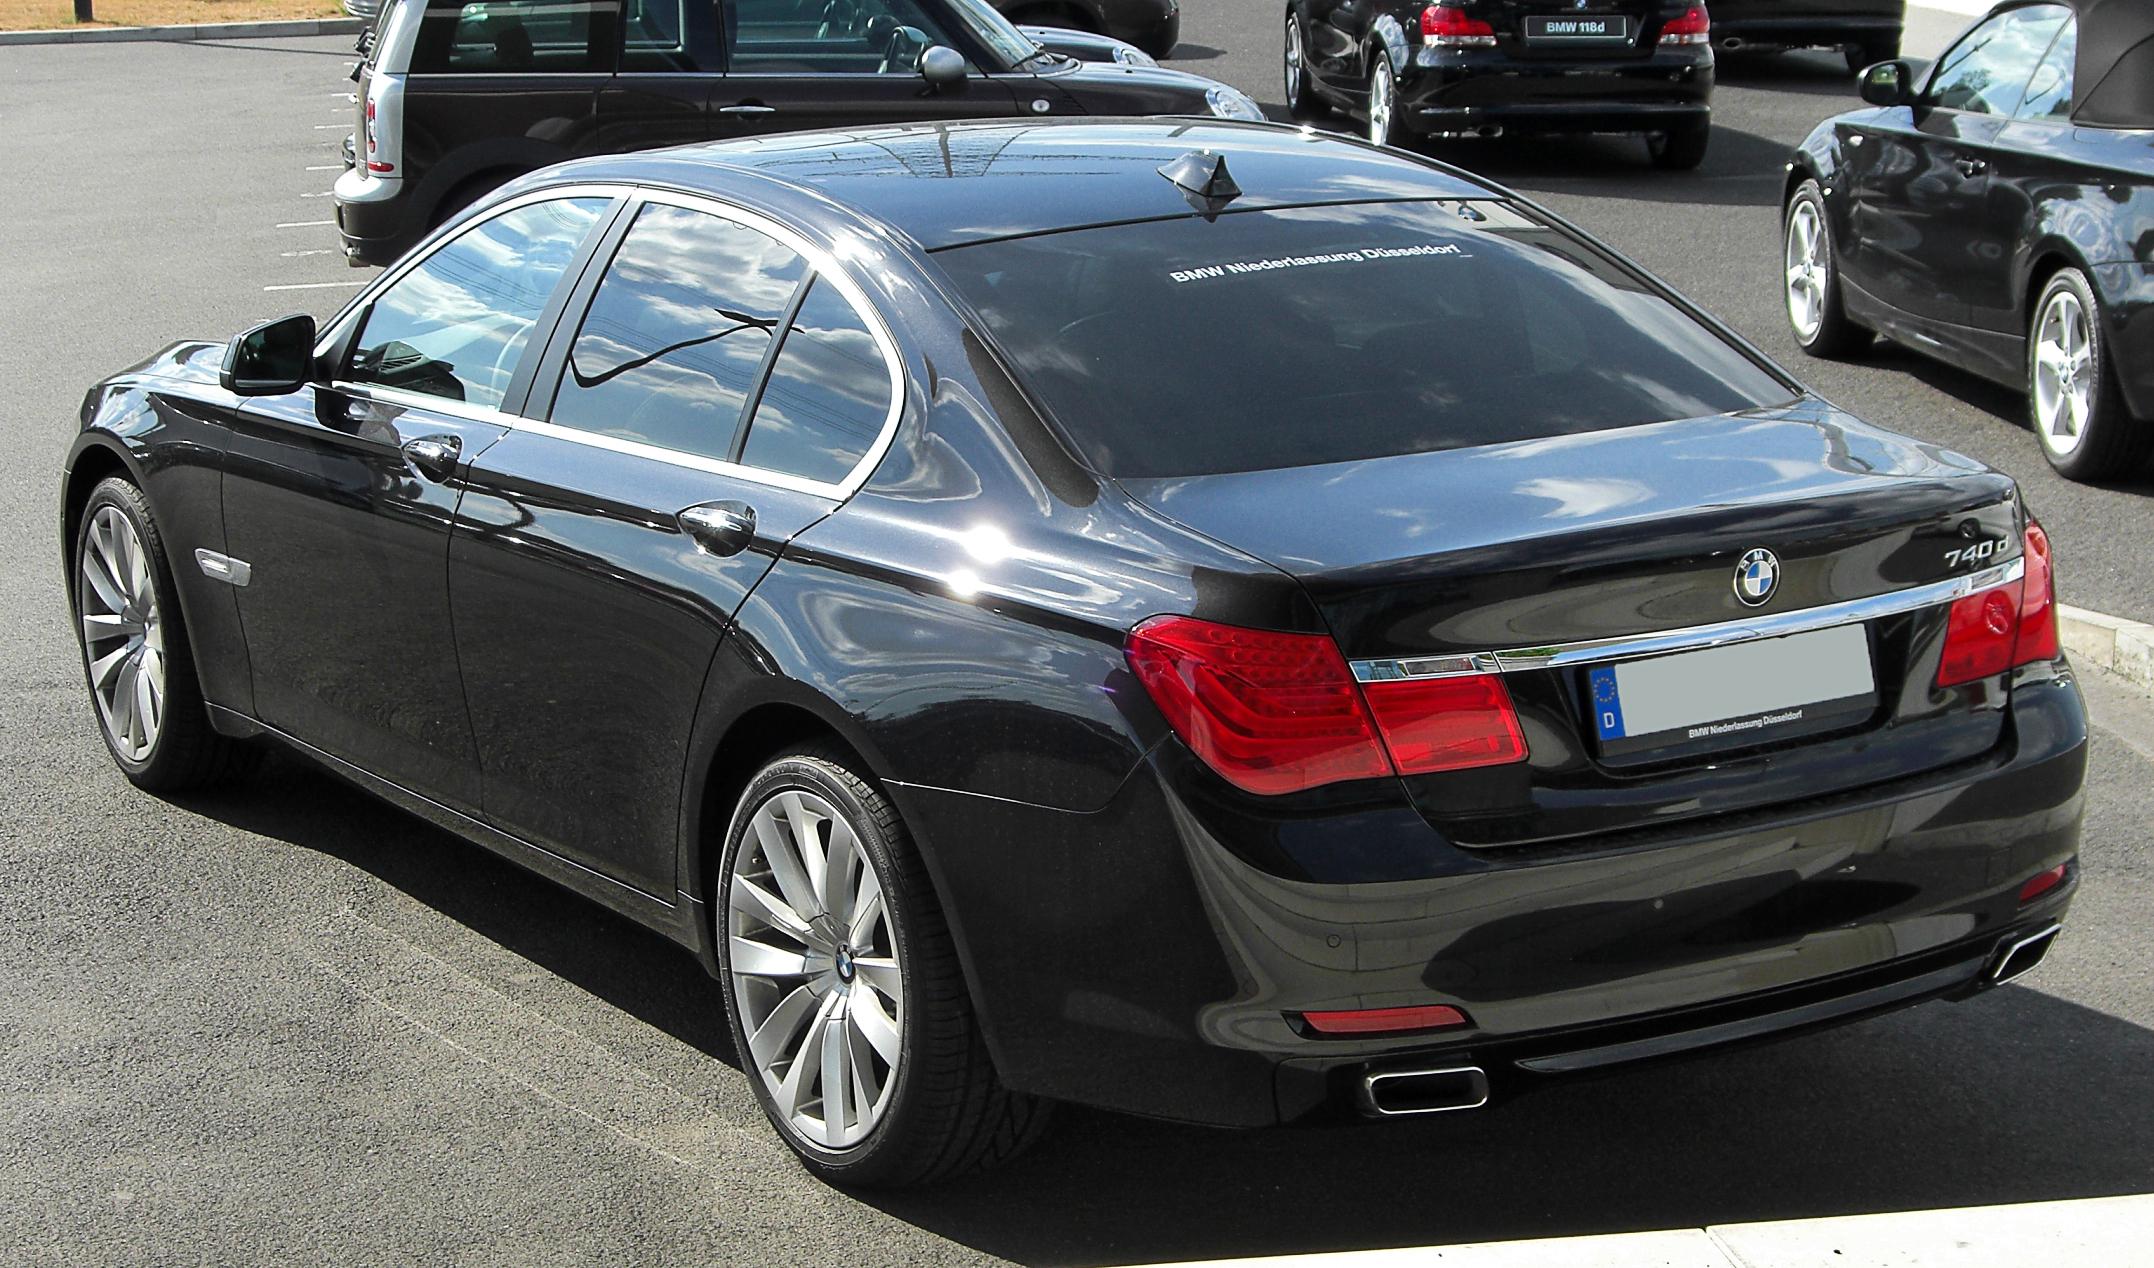 Bmw Rims 22 Inch >> File:BMW 740d (F01) rear 20100724.jpg - Wikimedia Commons